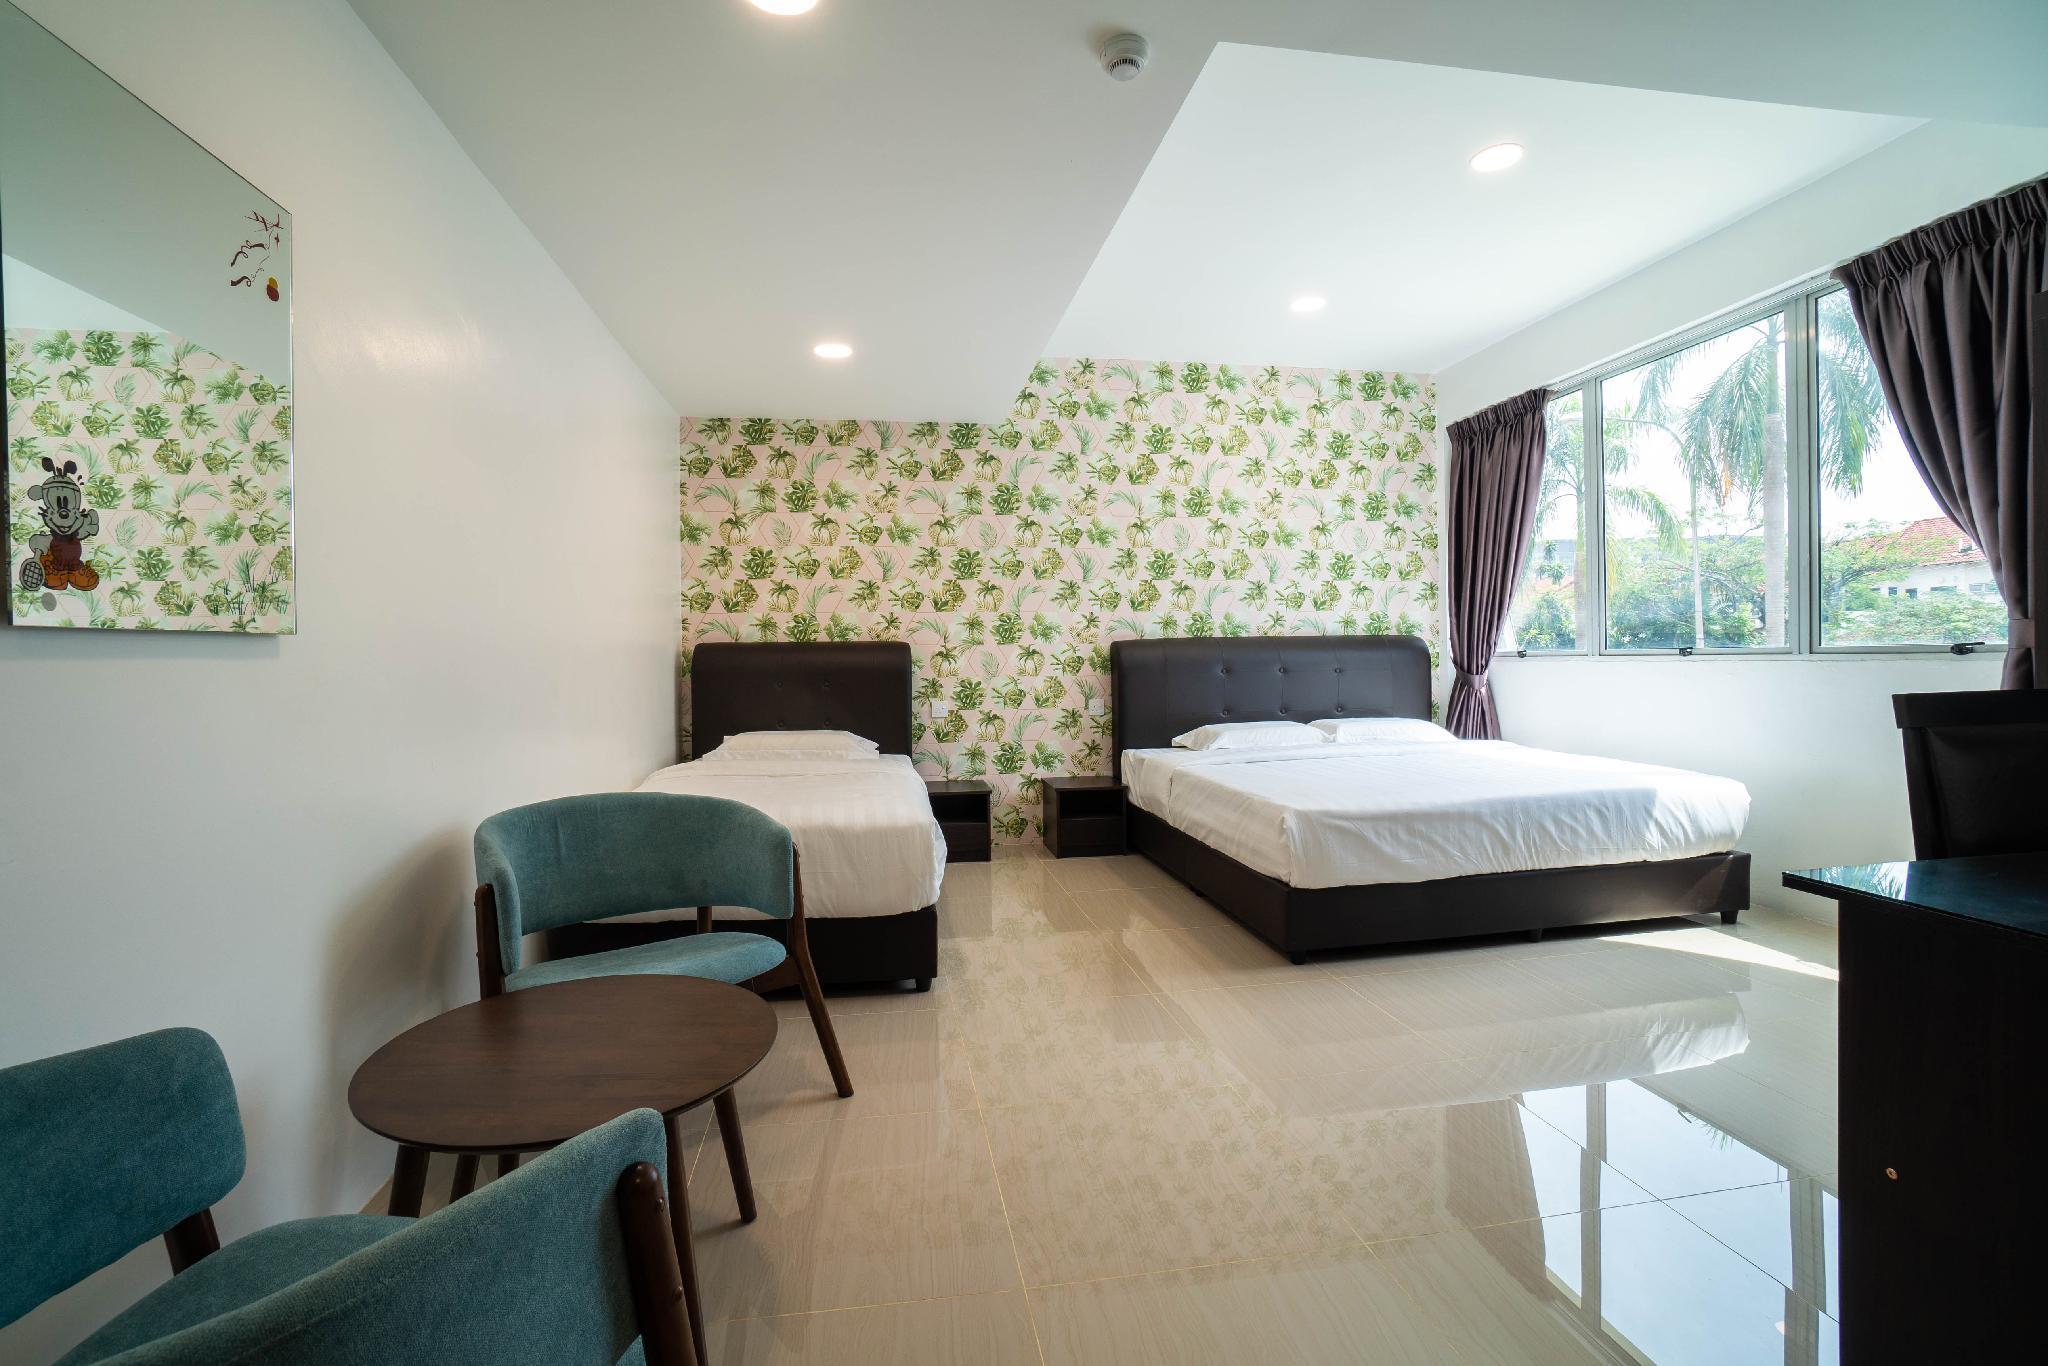 Crystal Garden Hotel (Tasik Selatan), Kuala Lumpur